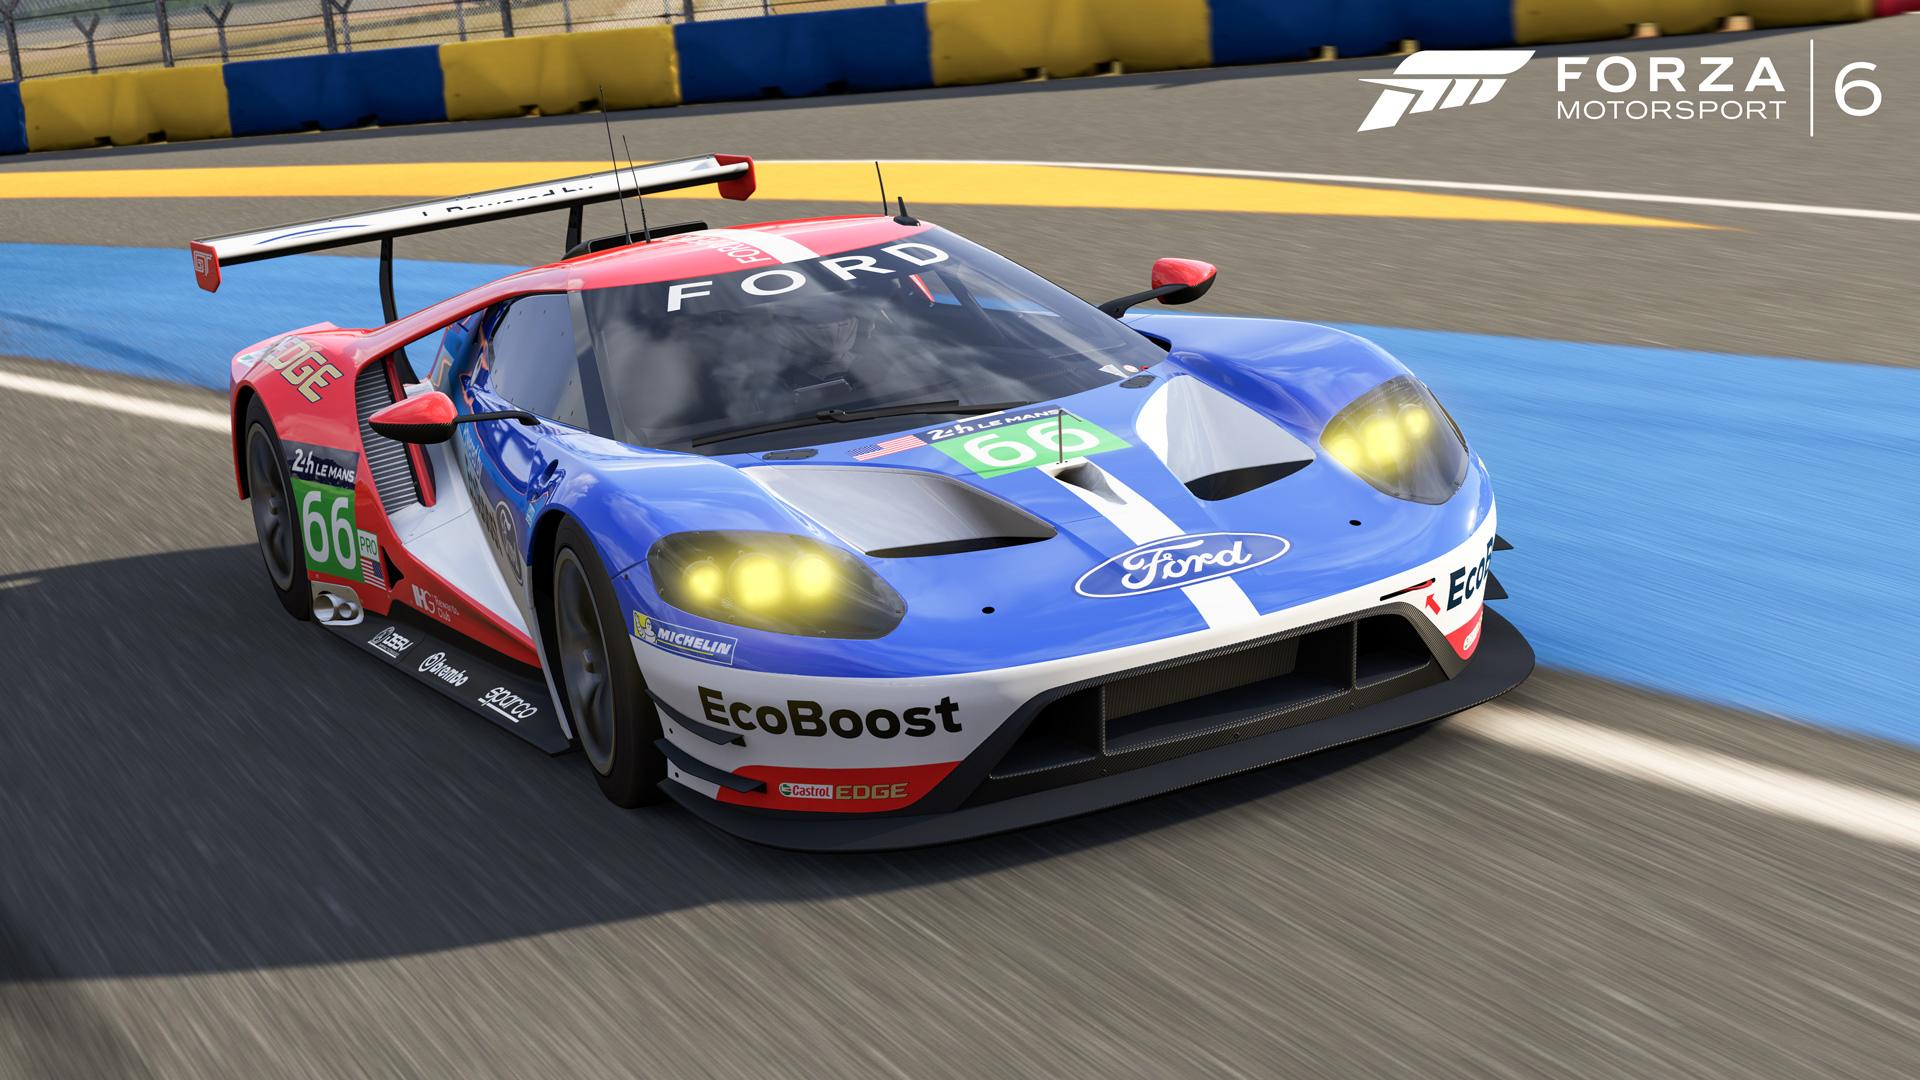 Forza-Racing-Championship-Forza-Motorsport